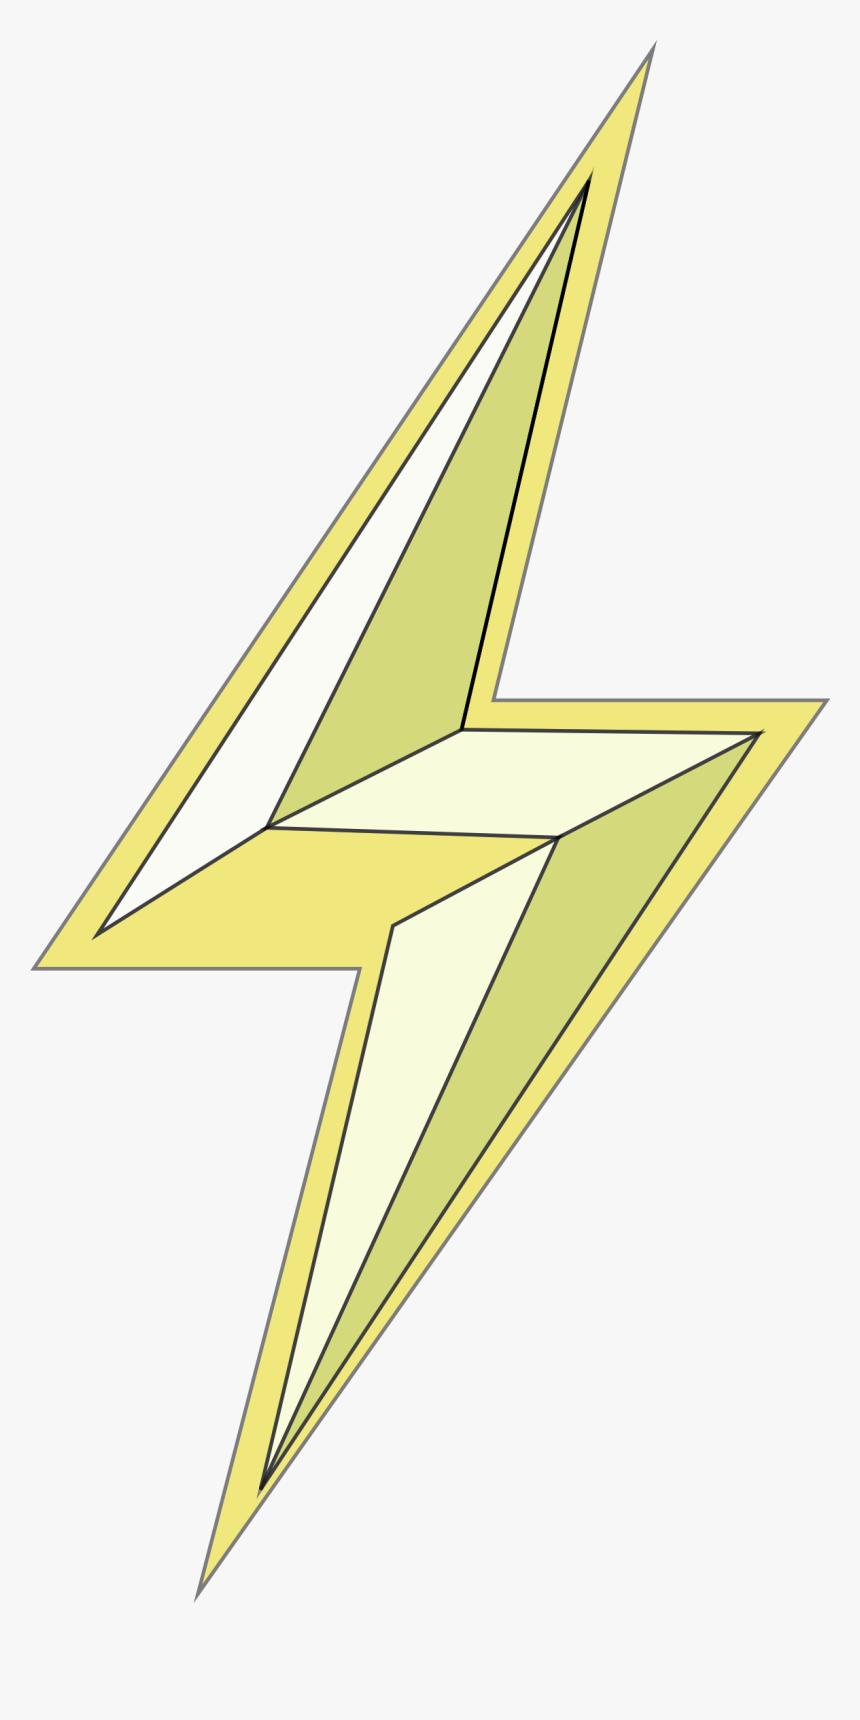 Stylized Lightning Bolt Clip Arts - Lightning Bolts Transparent Clipart, HD Png Download, Free Download